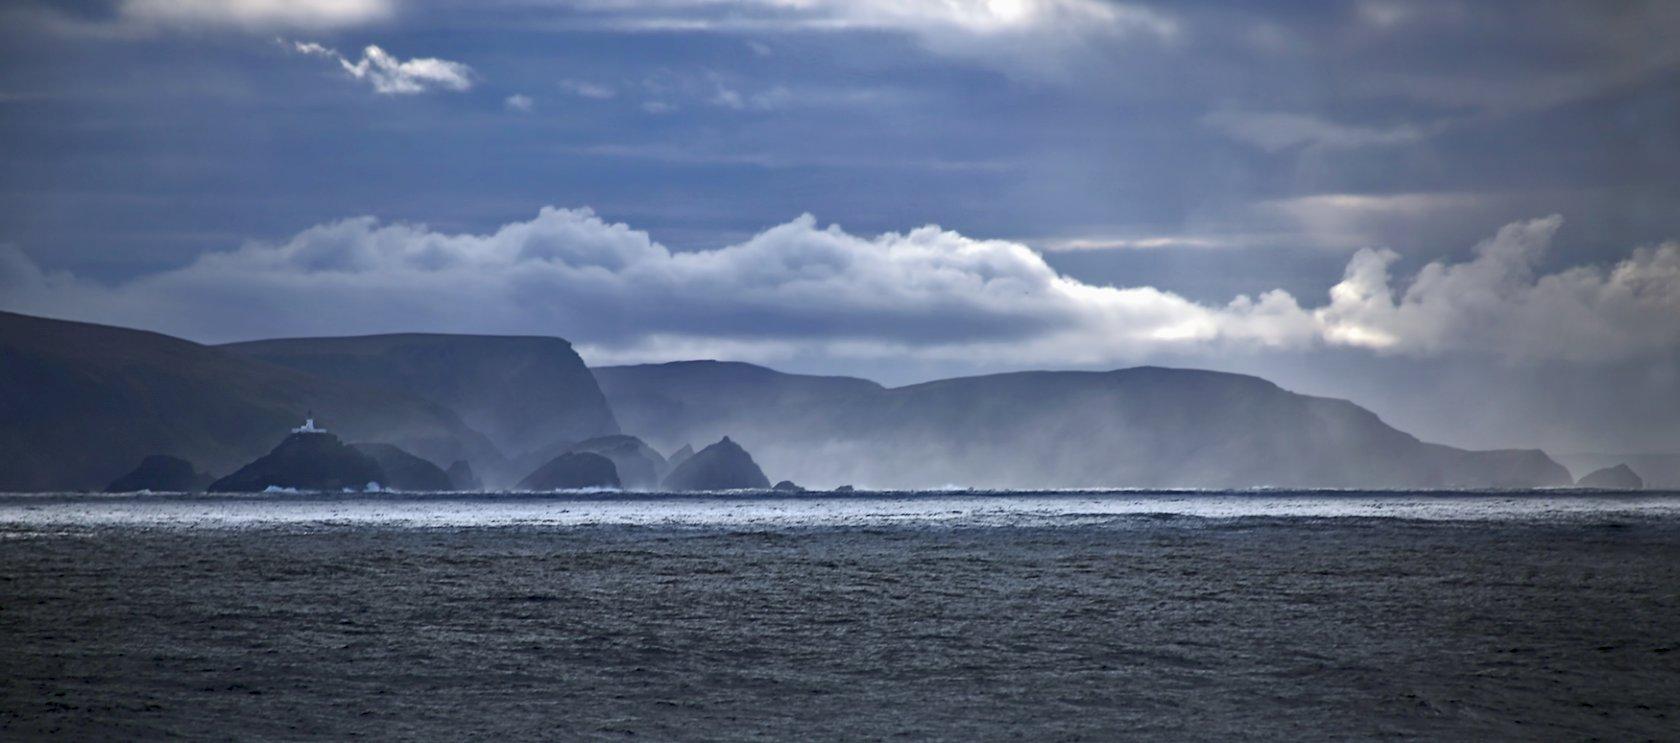 The coastline of the Shetland Islands of Scotland